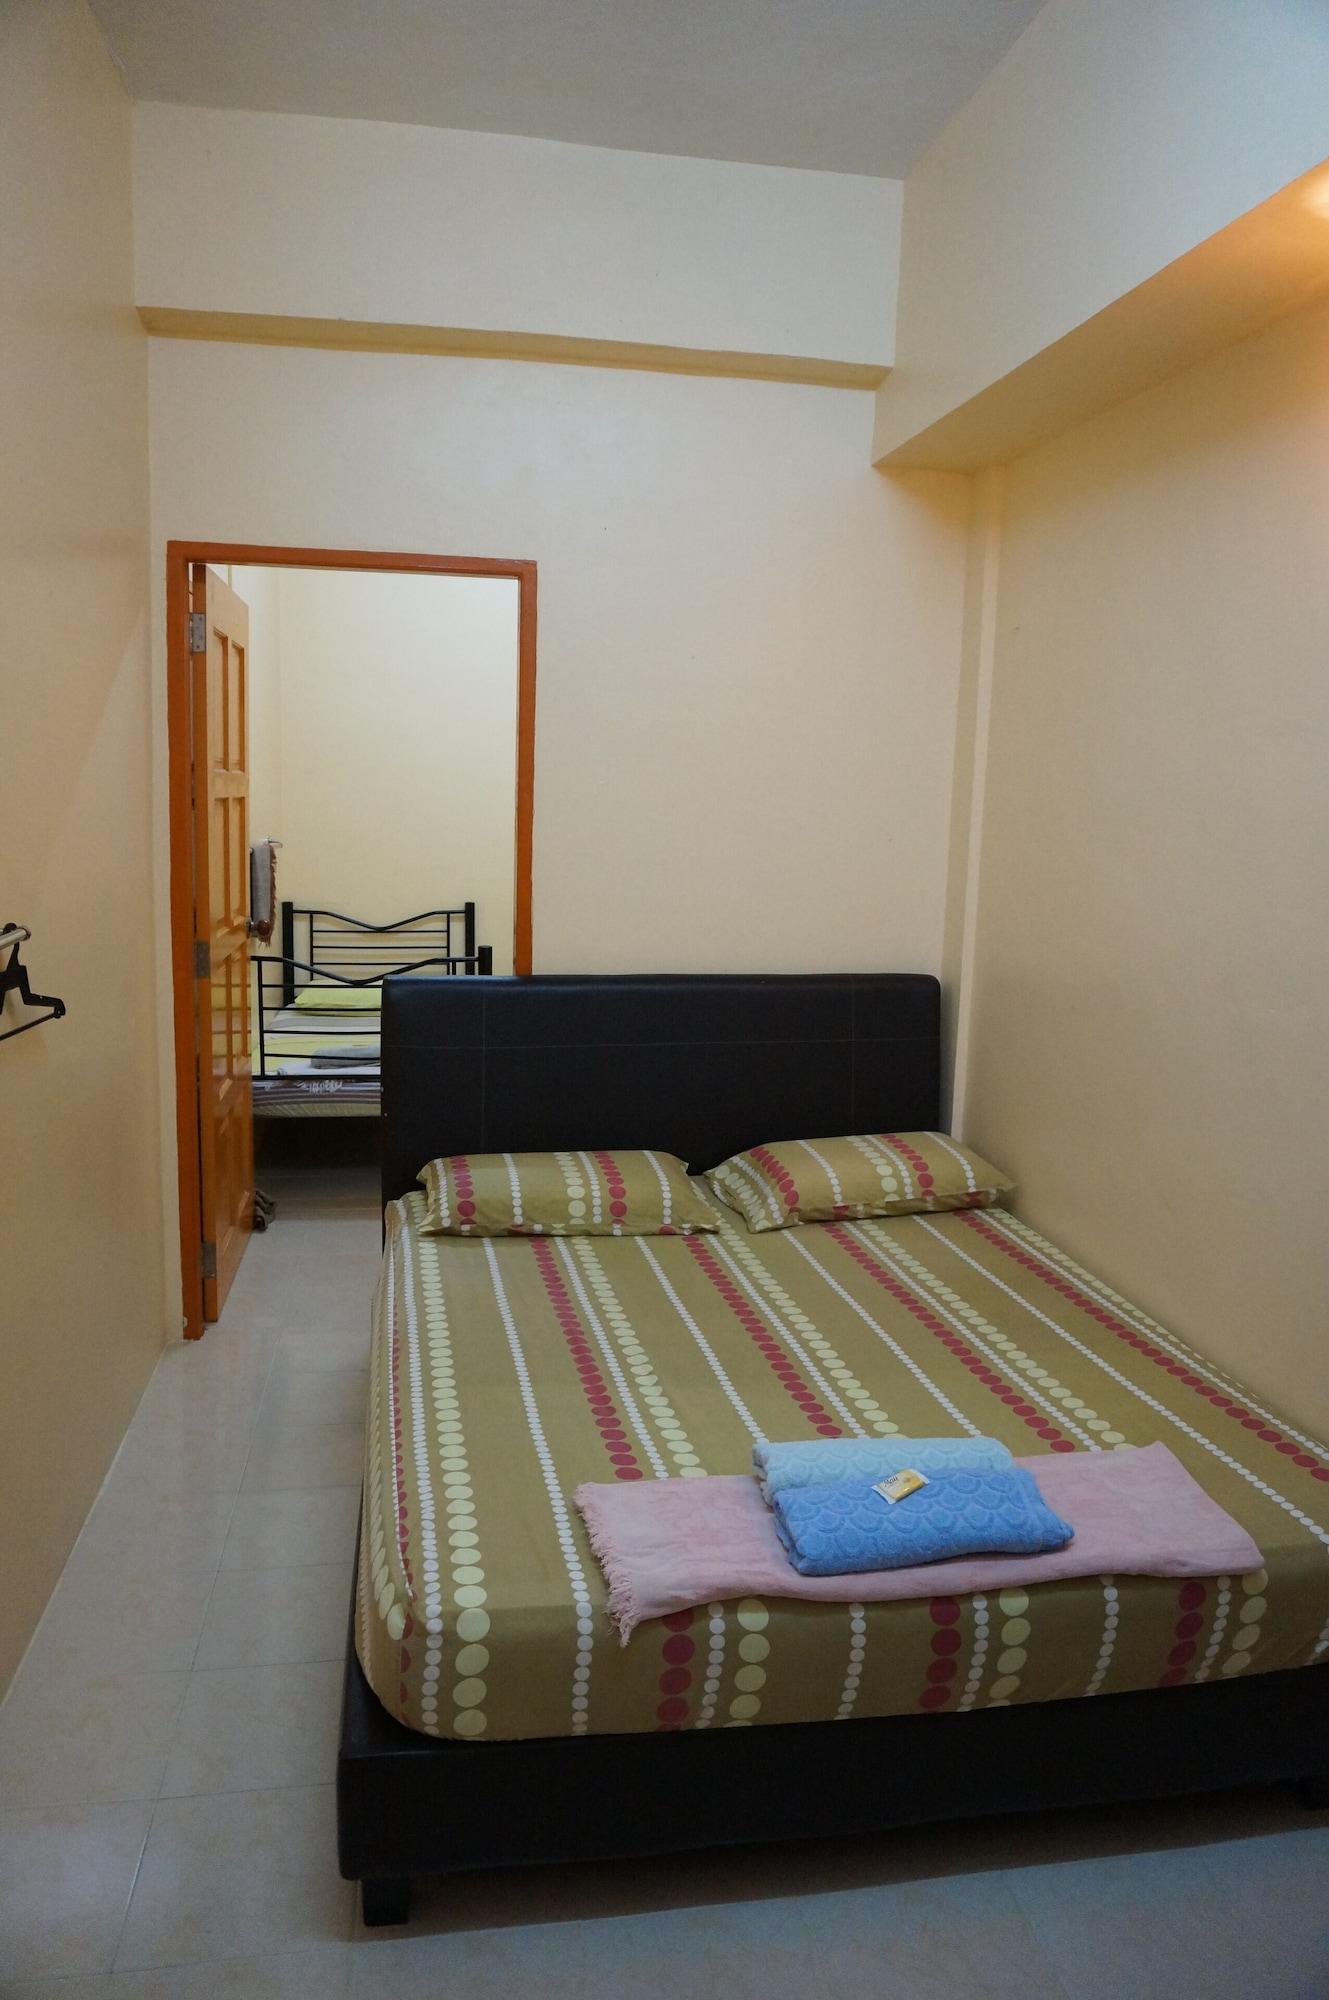 Hotel Bajet Gaya Warisan, Kota Bharu